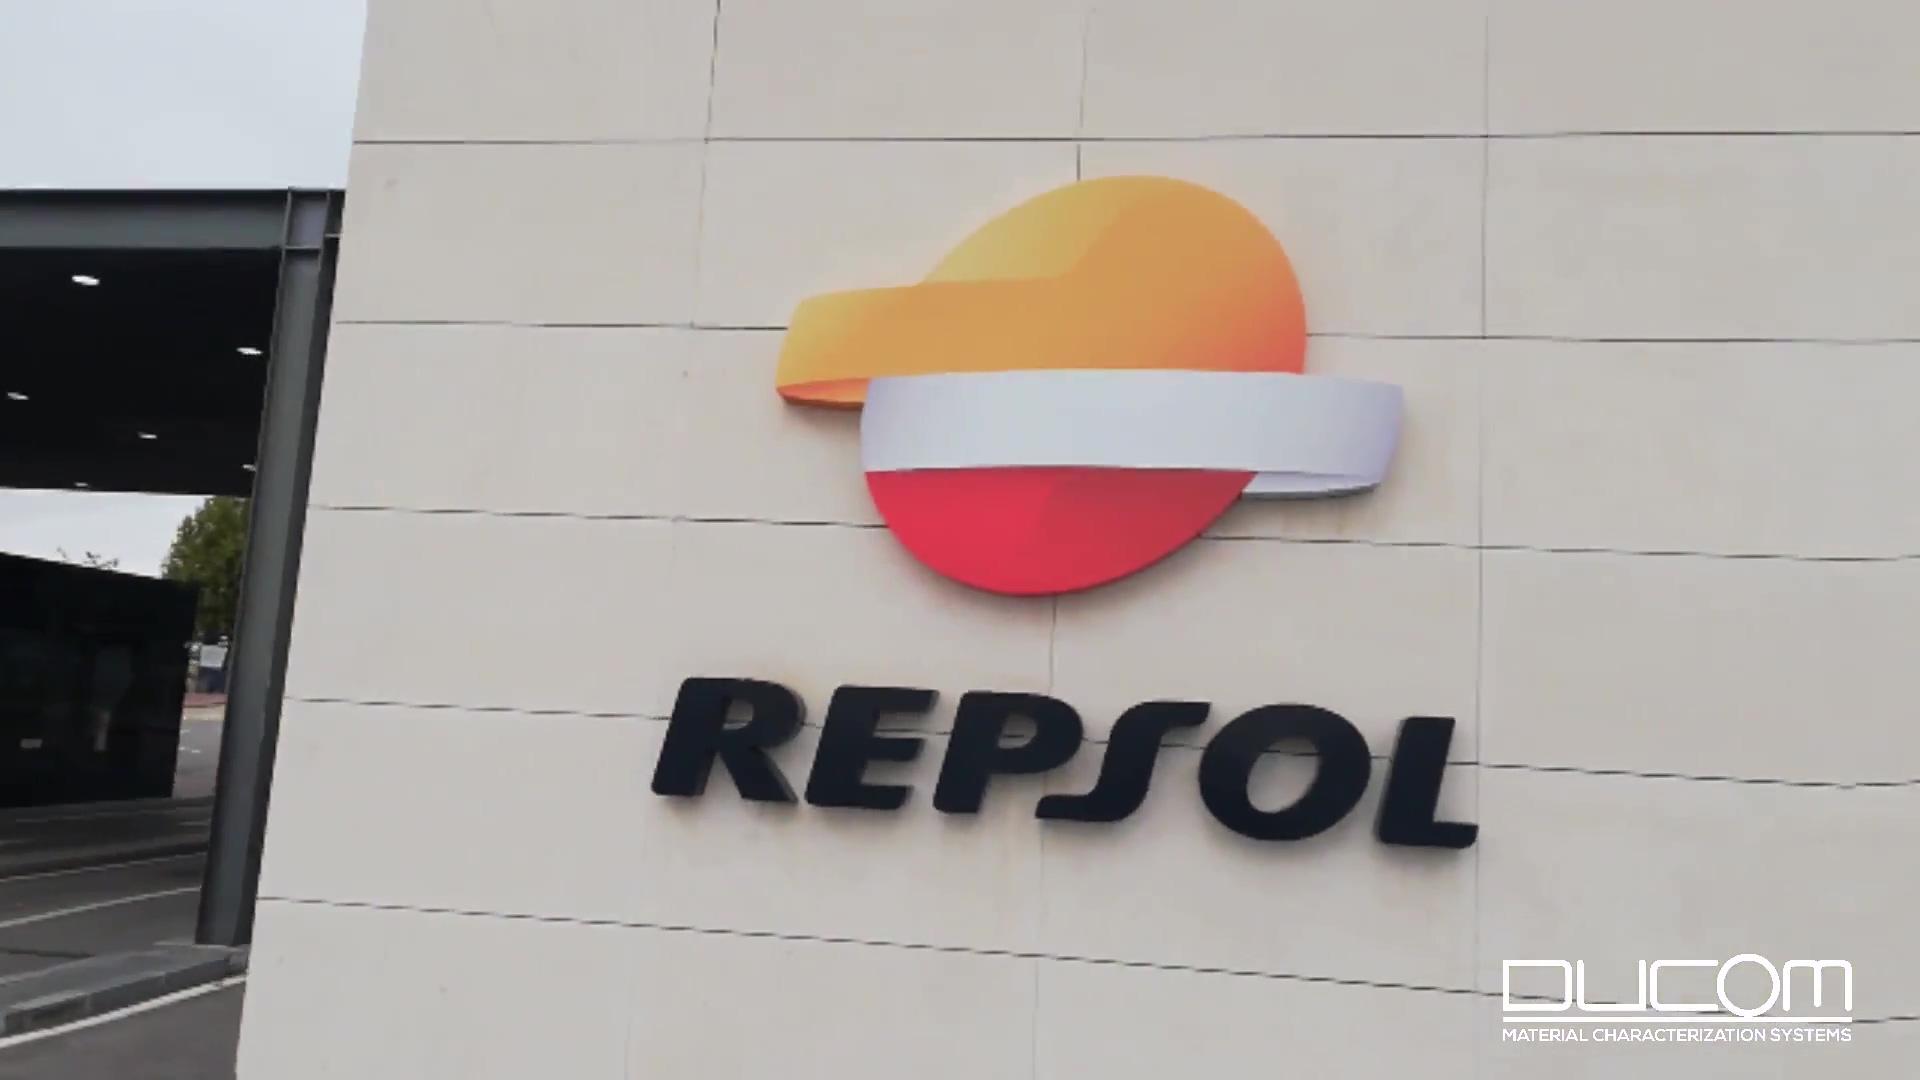 VD 22 - FBT3_Testimonial from Repsol